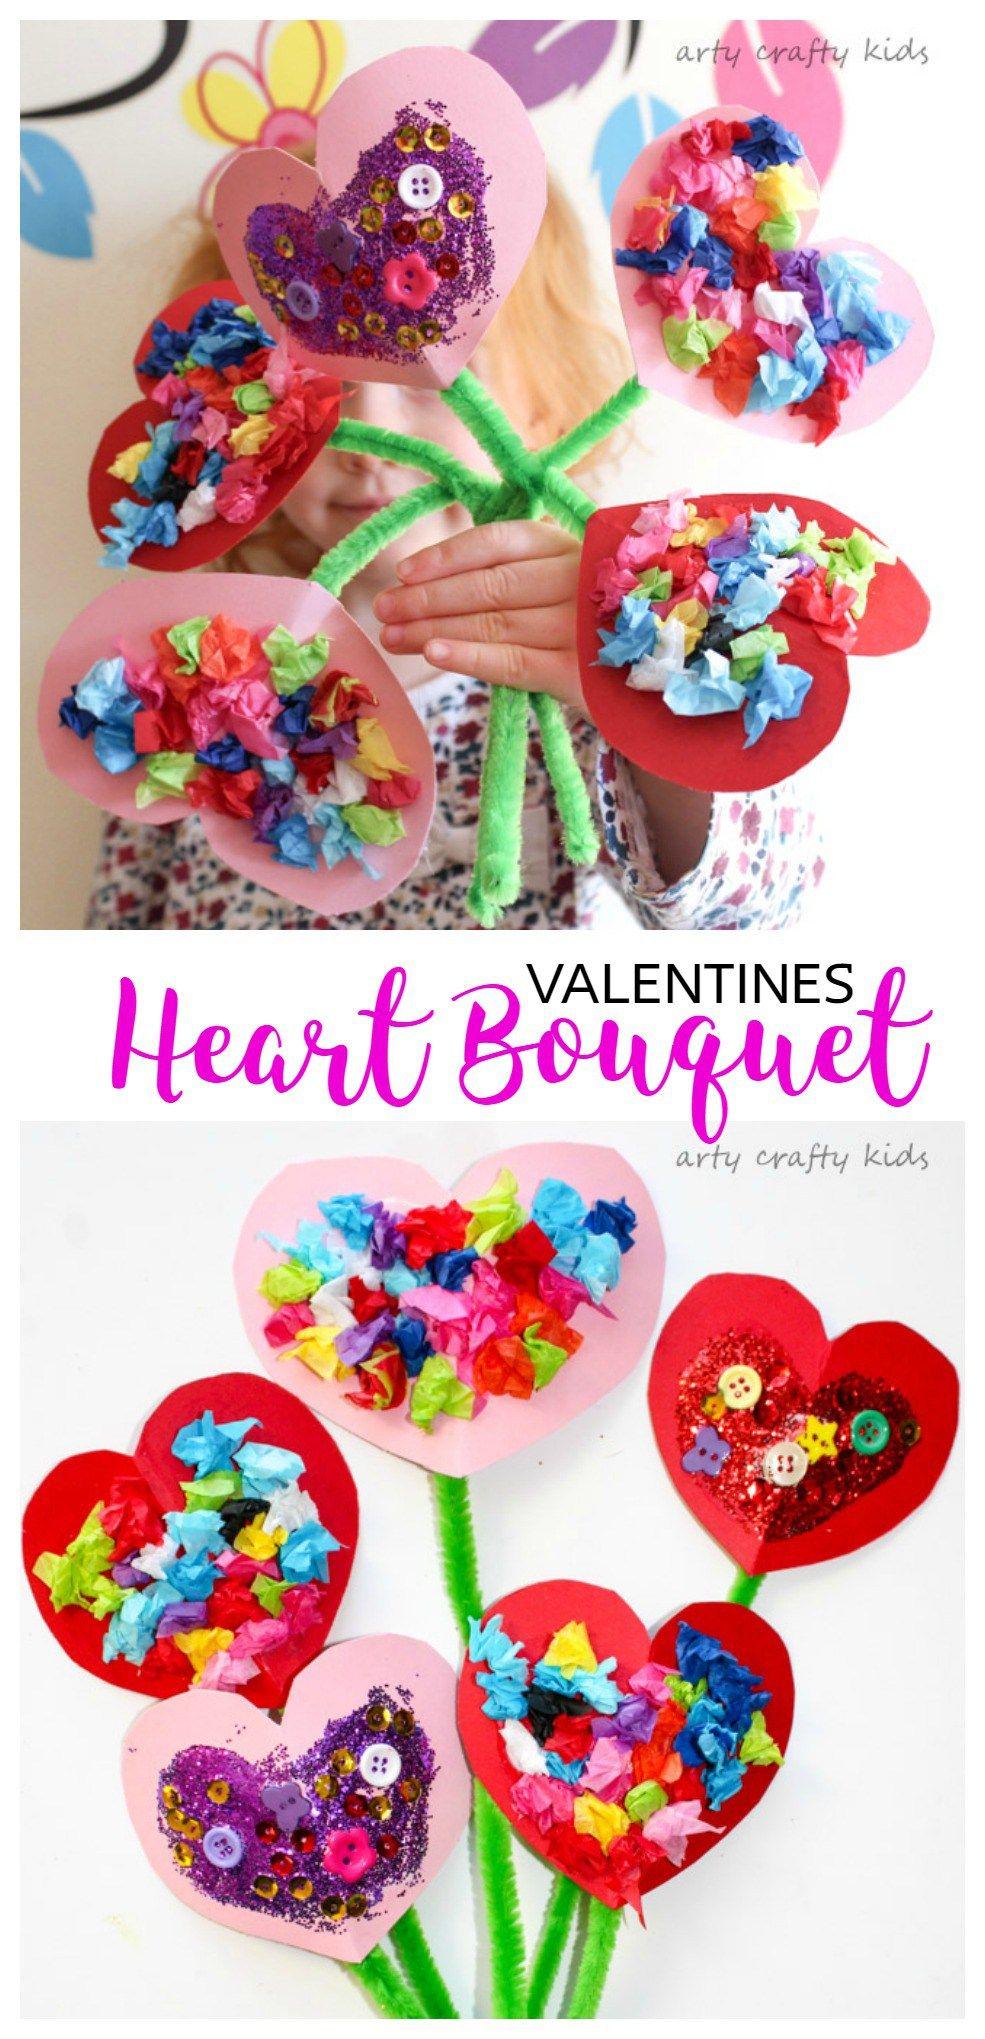 Toddler Valentines Heart Bouquet Valentine S Day For Kids